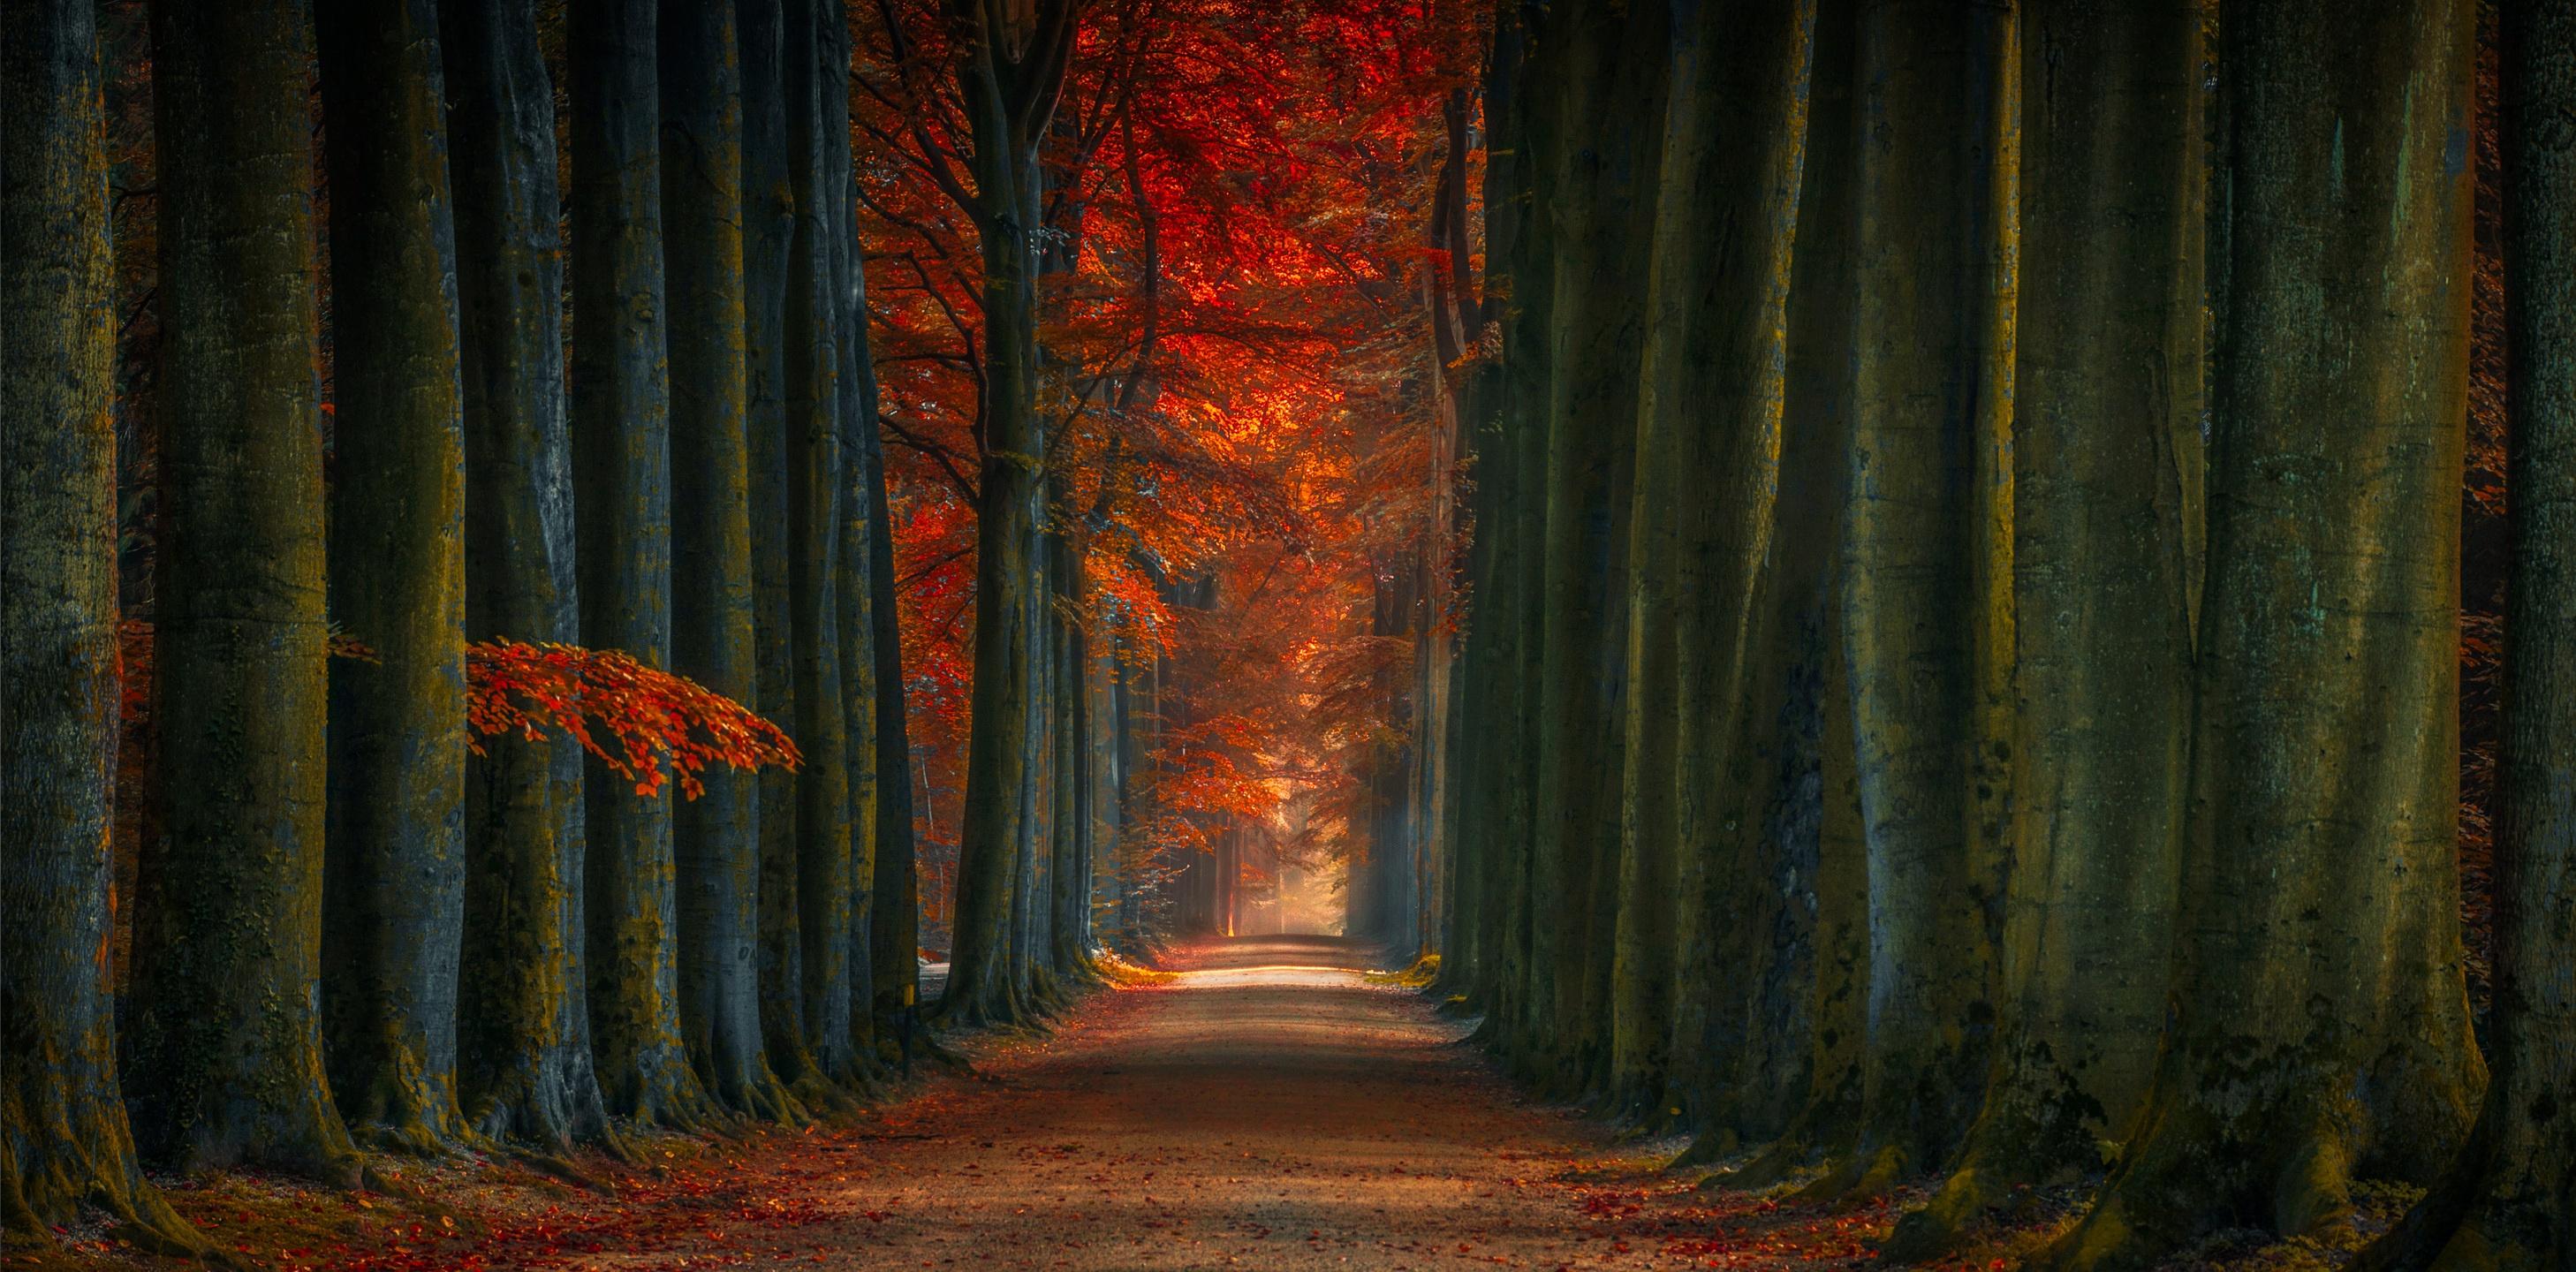 Tree lined winter fall alone road hd nature 4k - Nature ka wallpaper ...